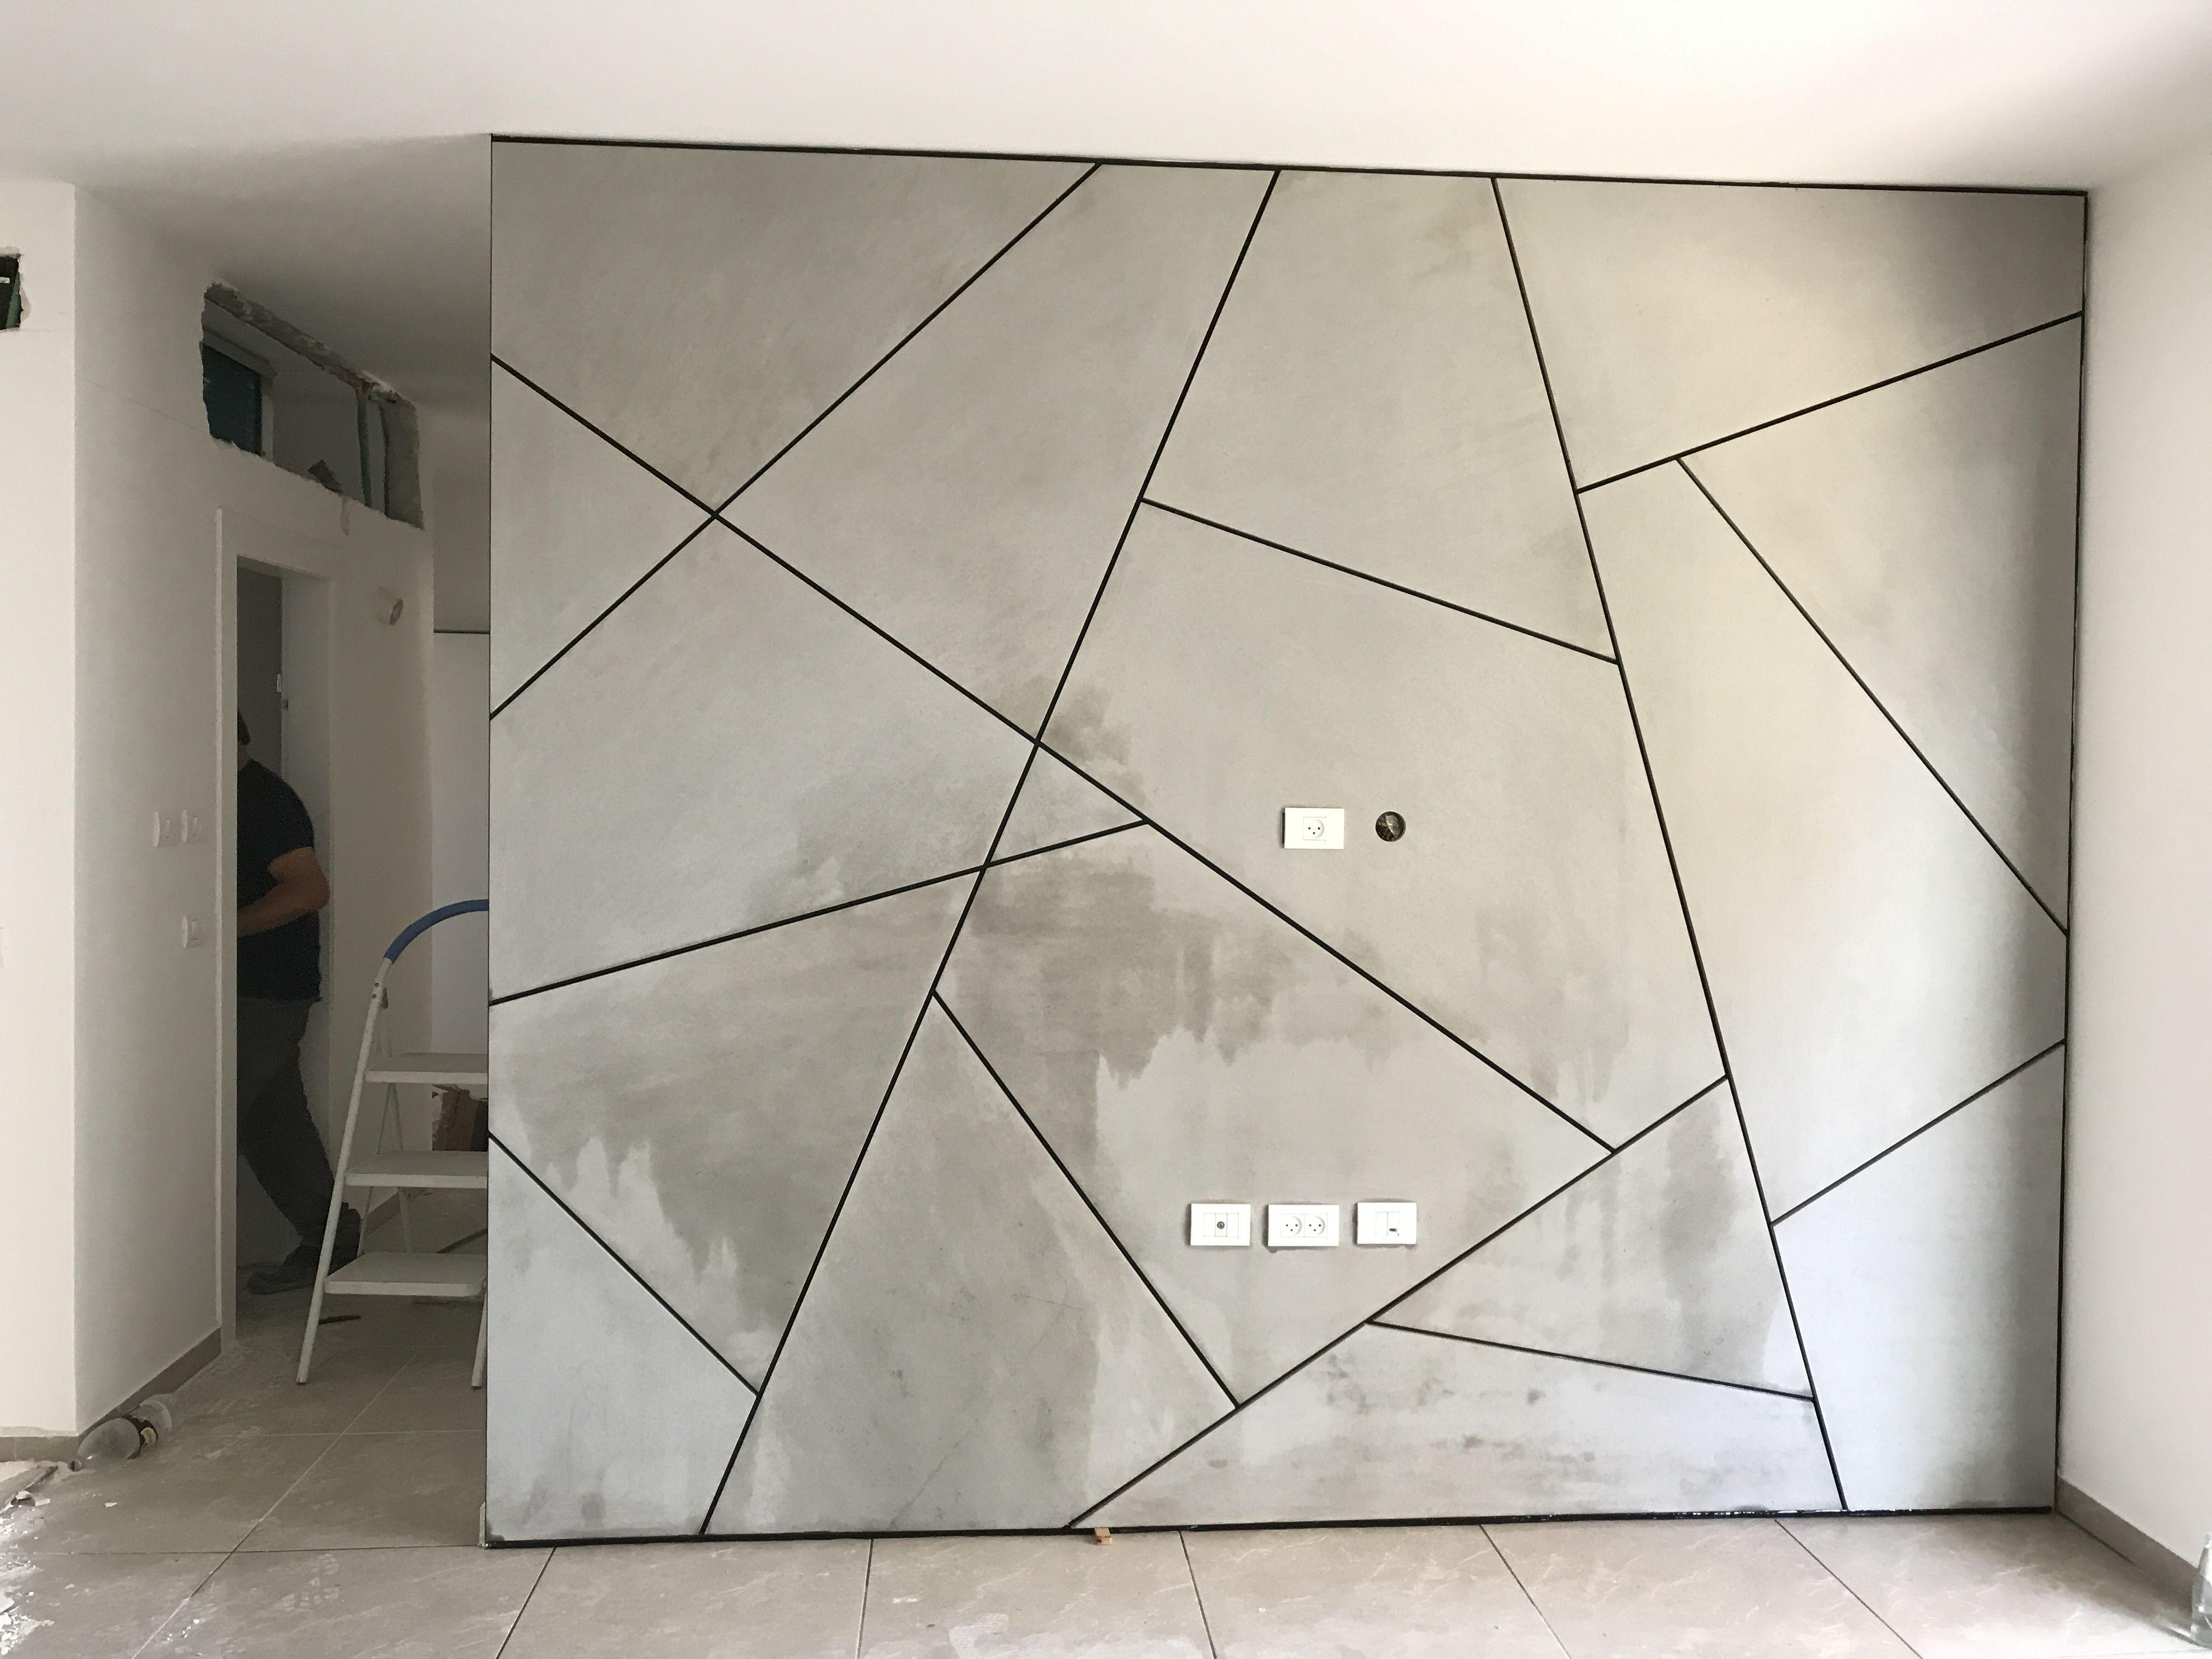 Pin Ot Polzovatelya Lu Zihui Na Doske Wall Design Stena Dizajn Interer Kvartirnye Idei